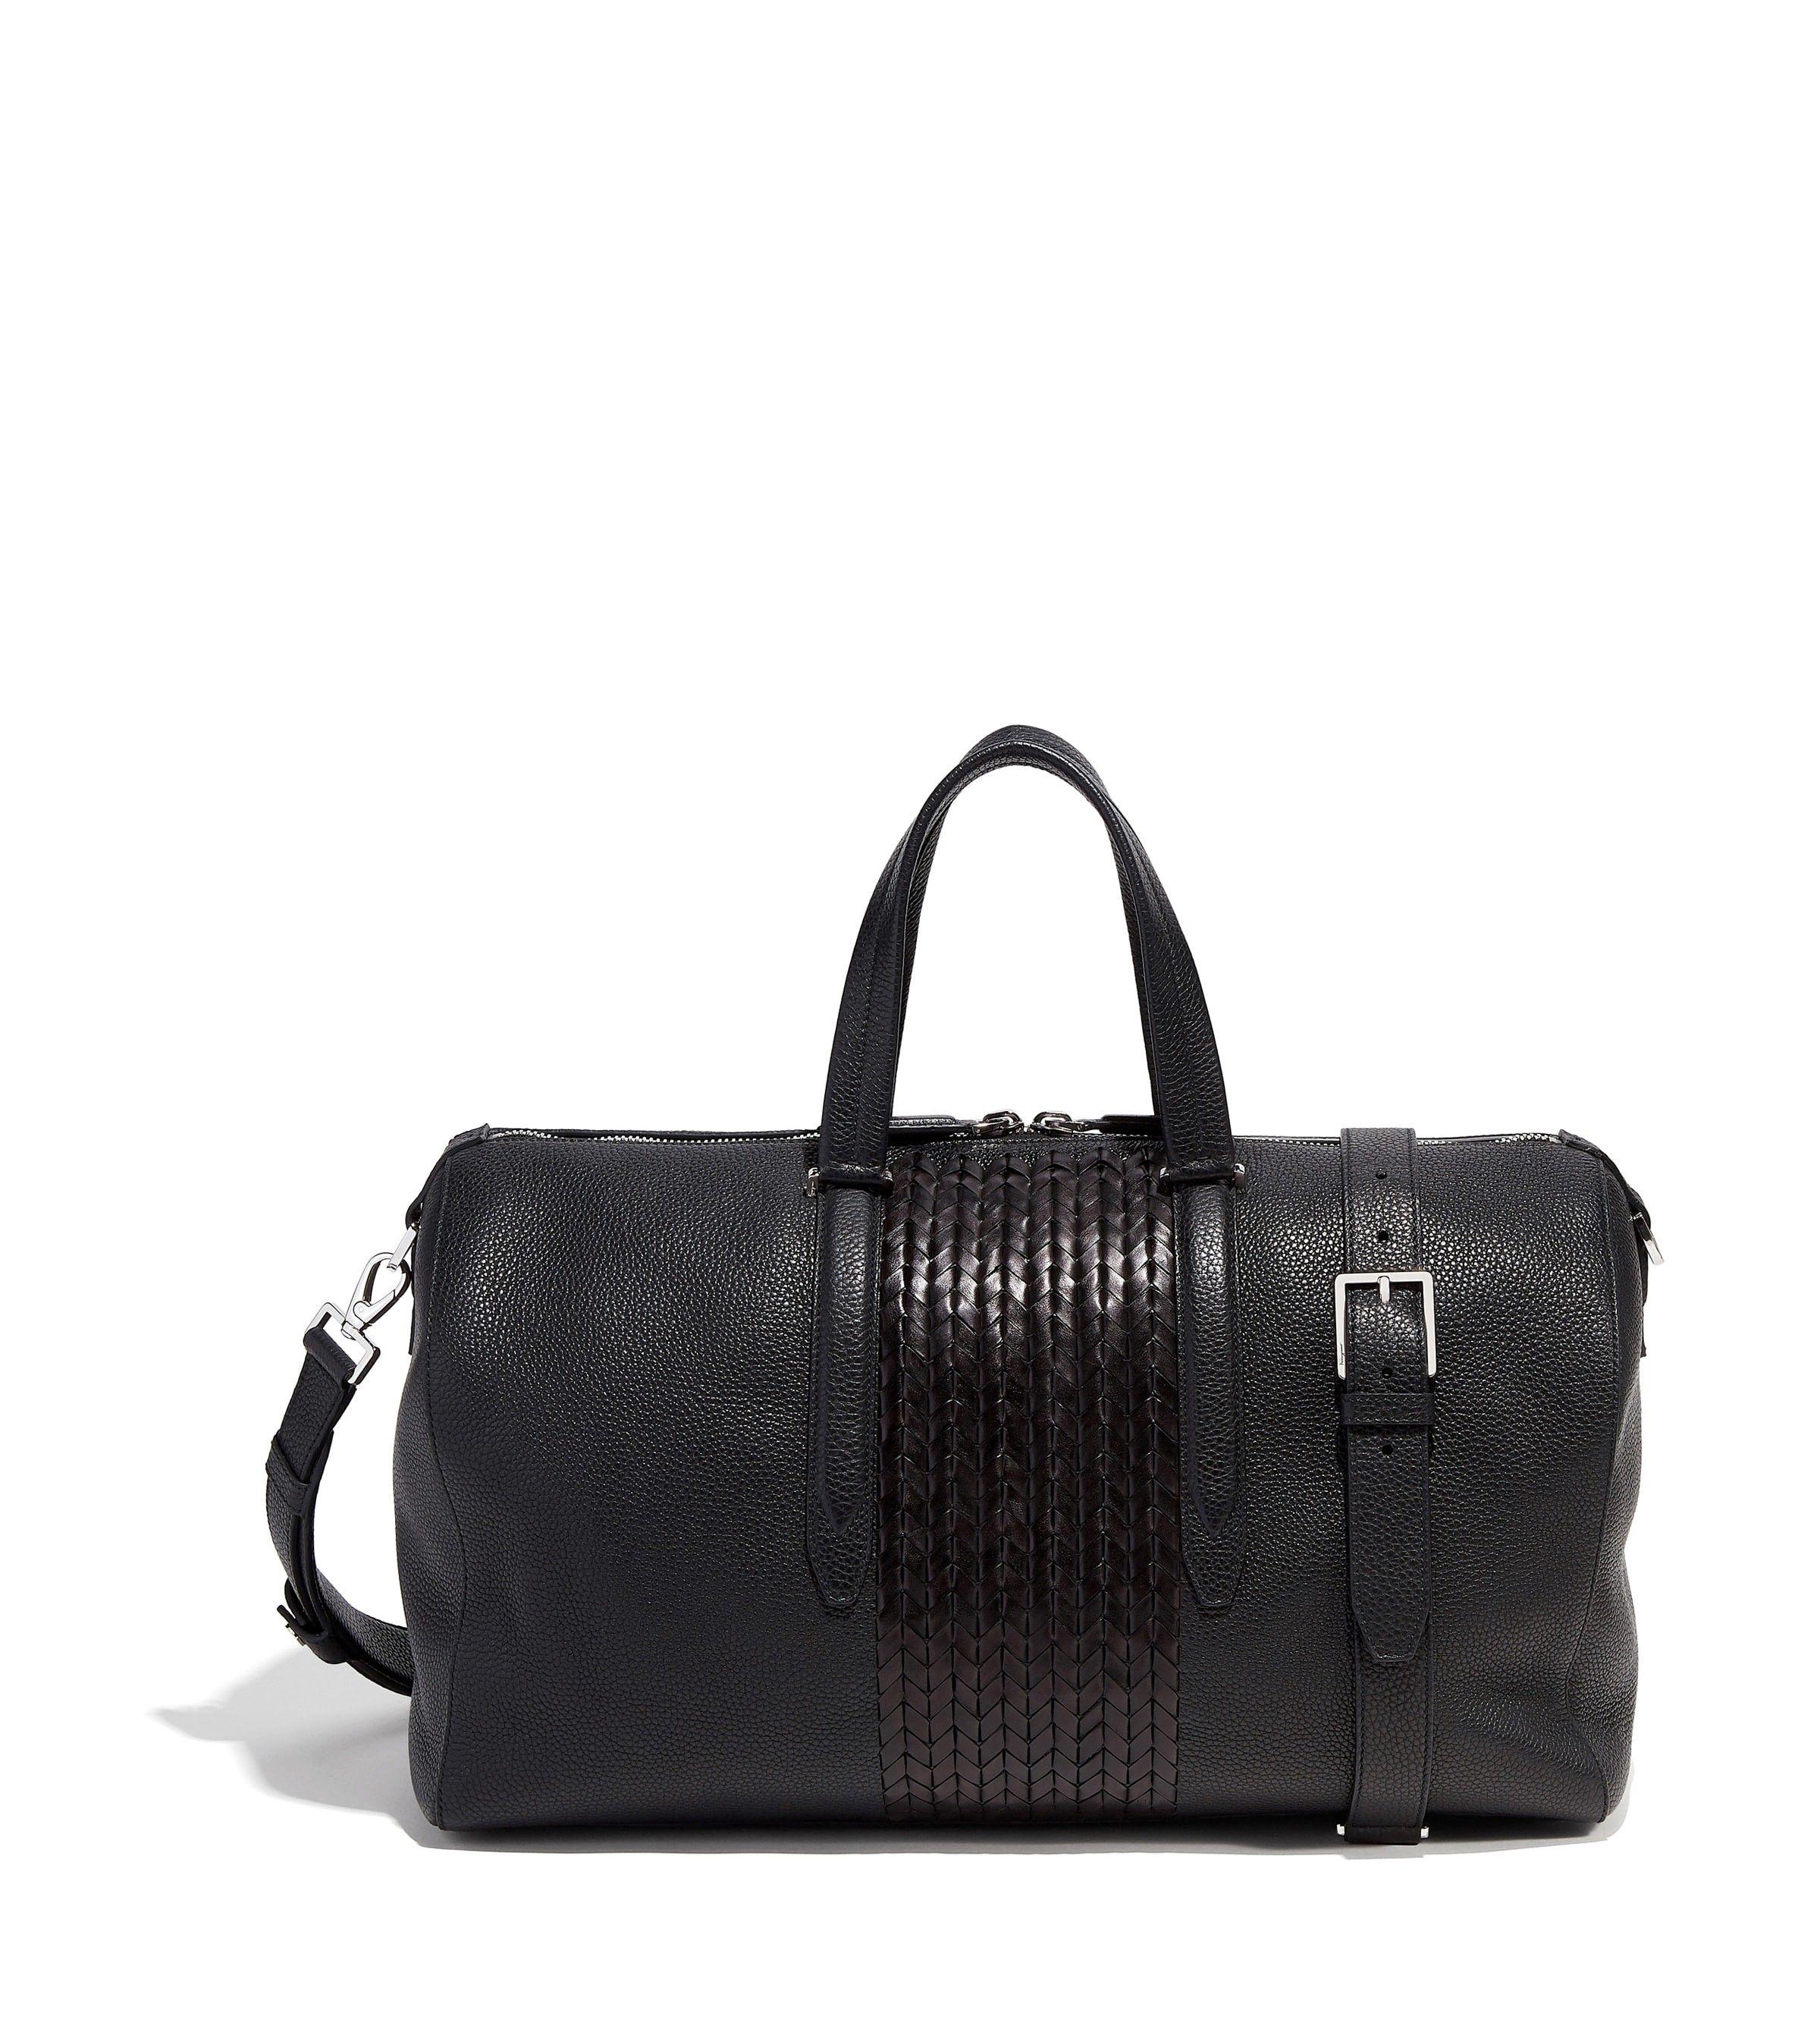 77a4418a4ac8 SALVATORE FERRAGAMO Duffle Bag with Woven Details.  salvatoreferragamo  bags   shoulder bags  hand bags